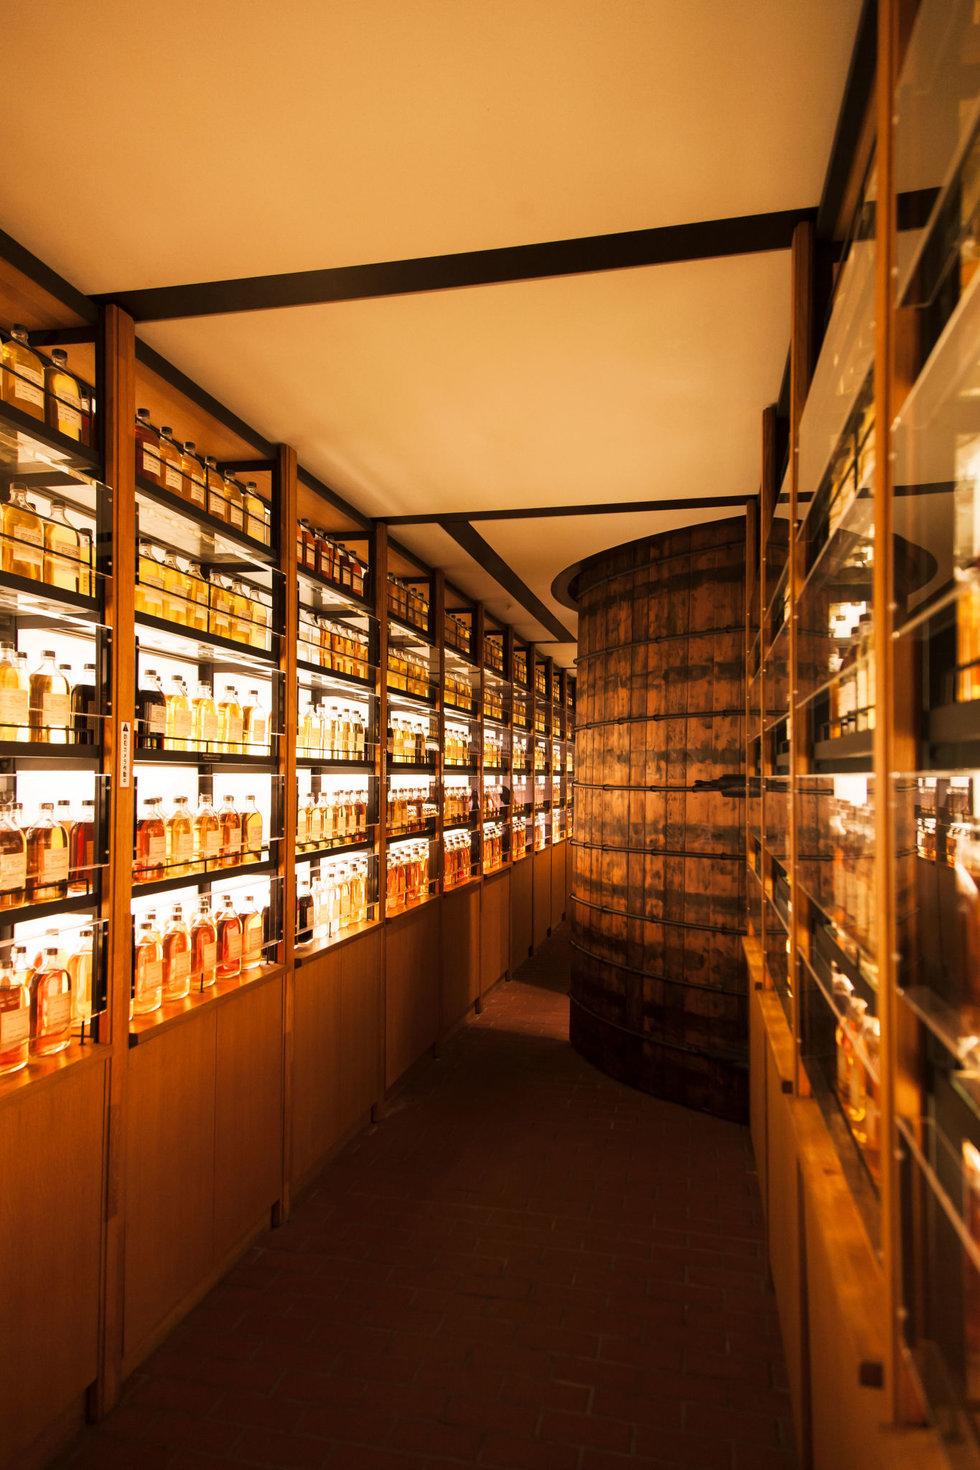 The Yamazaki Whiskey Museum